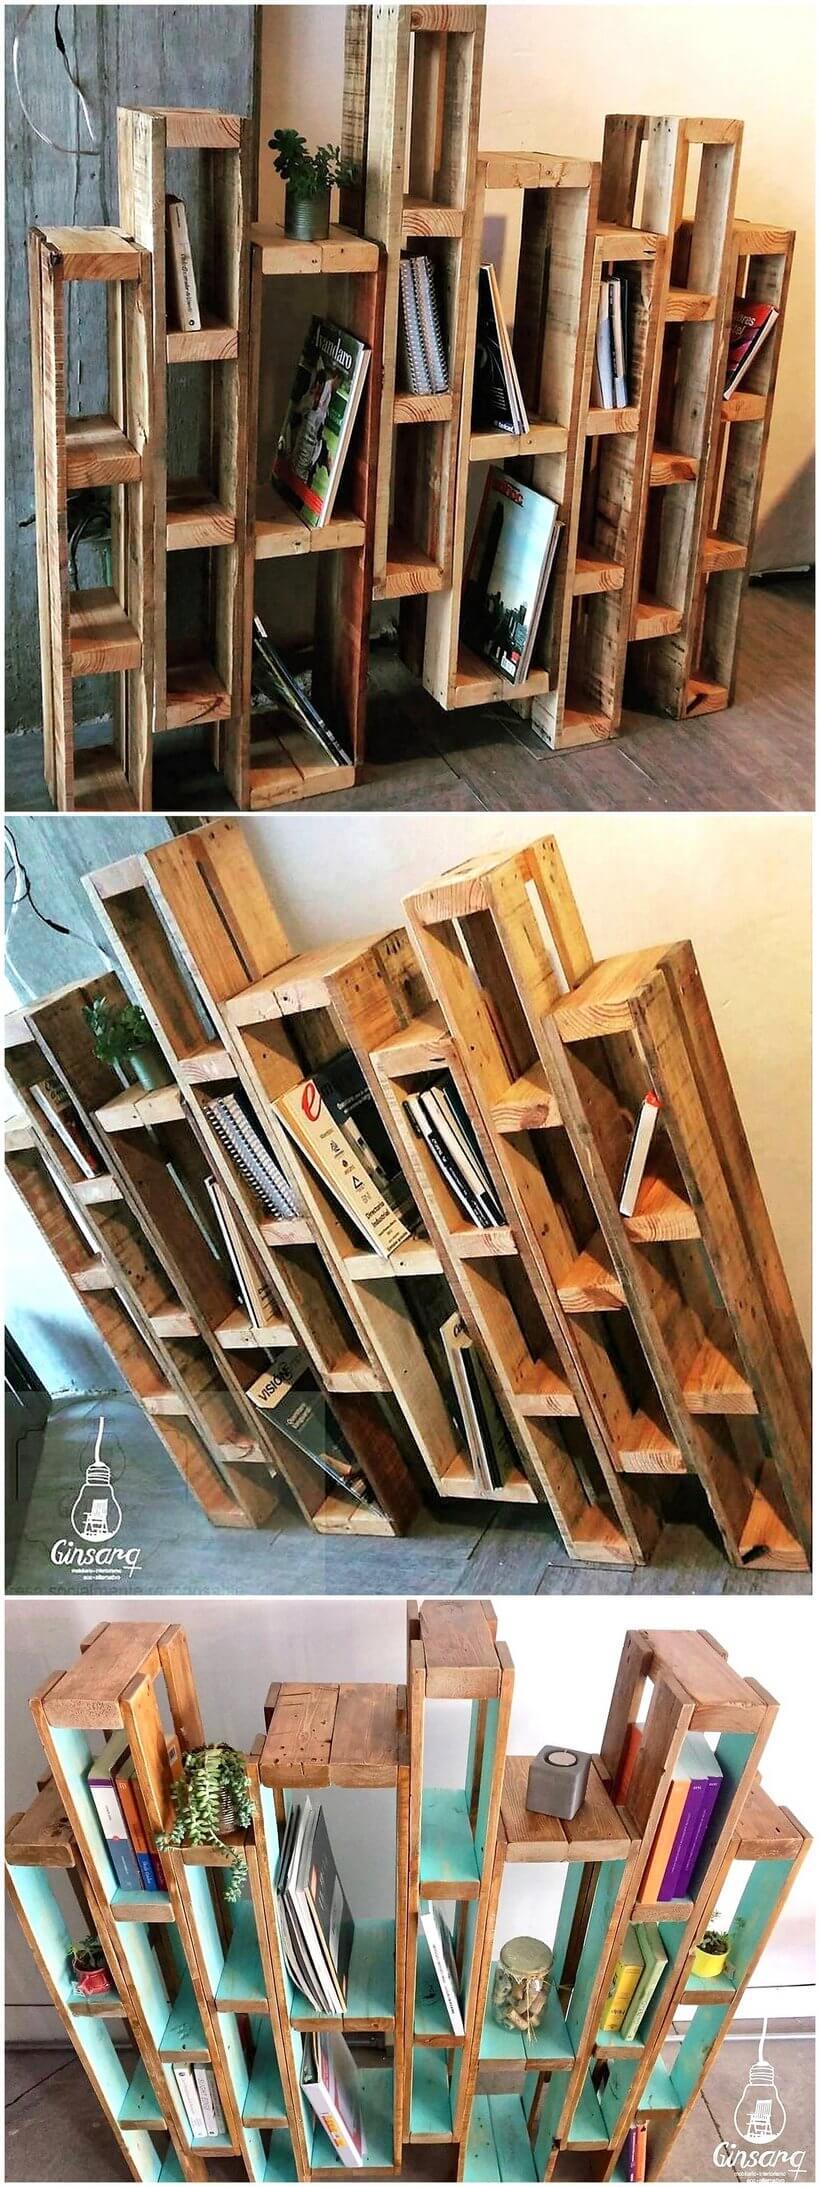 pallet bookshelf idea